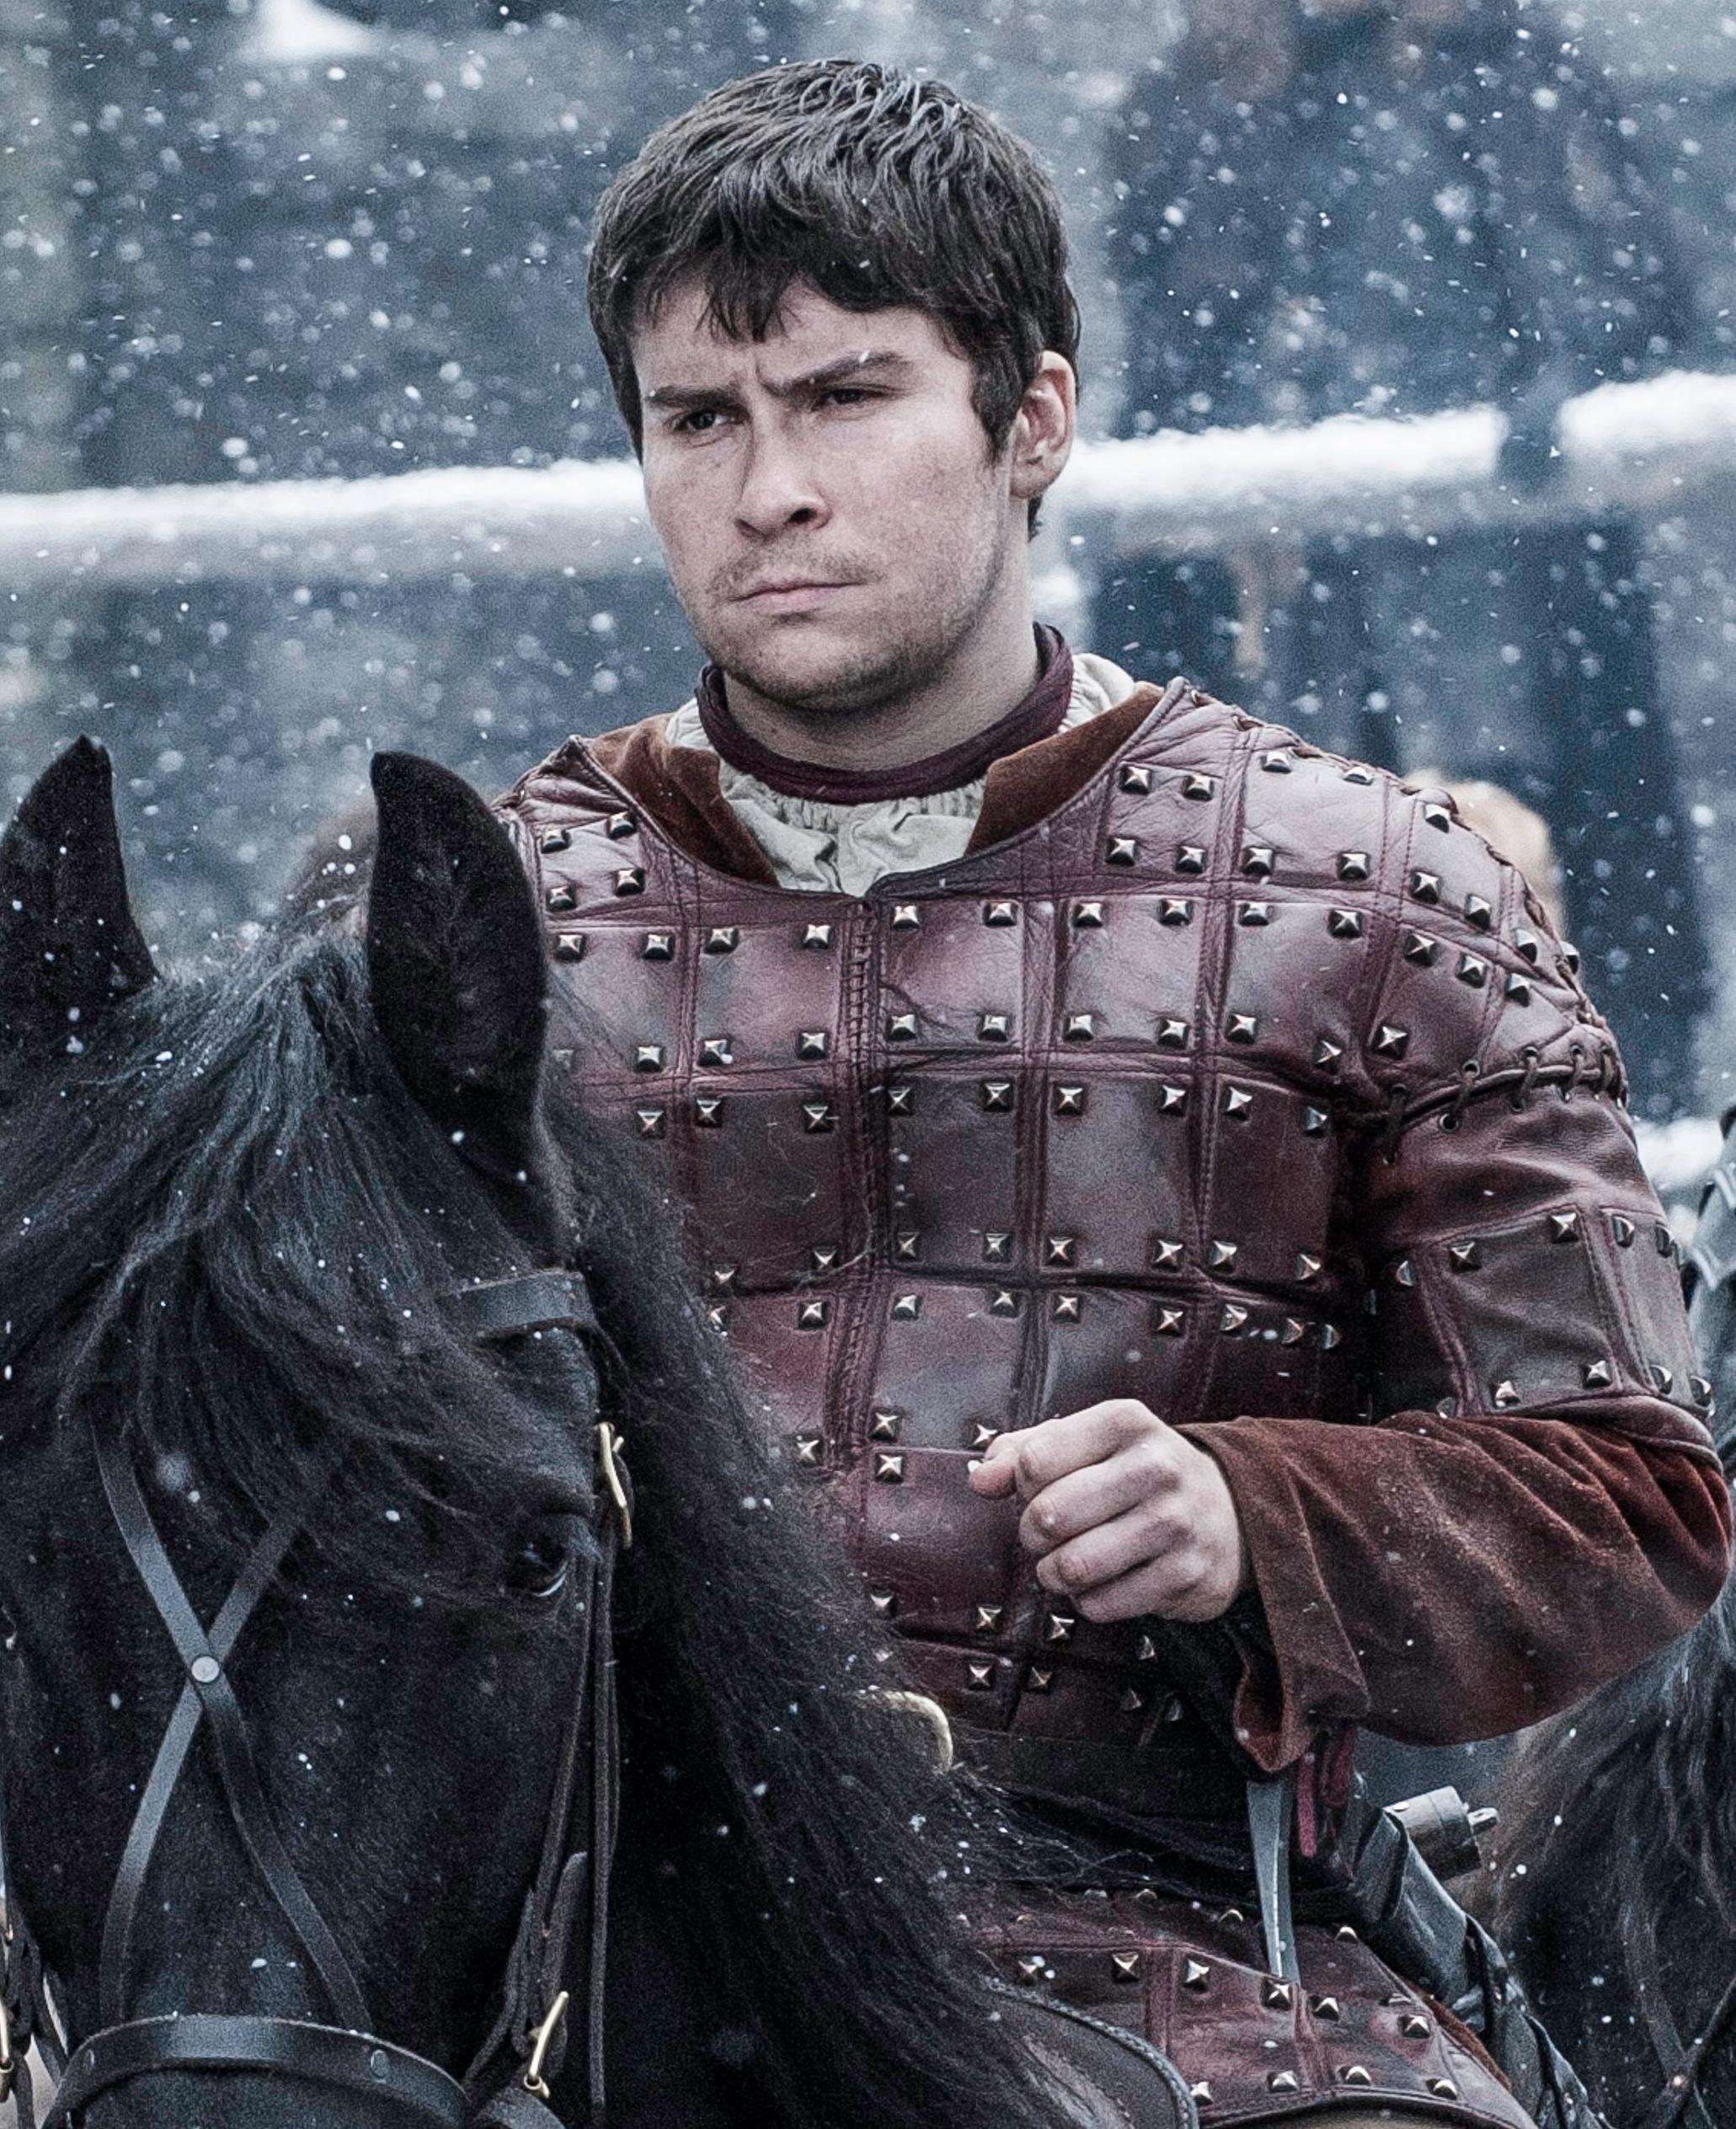 Podrick Game of Thrones Fan art: Help and critique needed ...